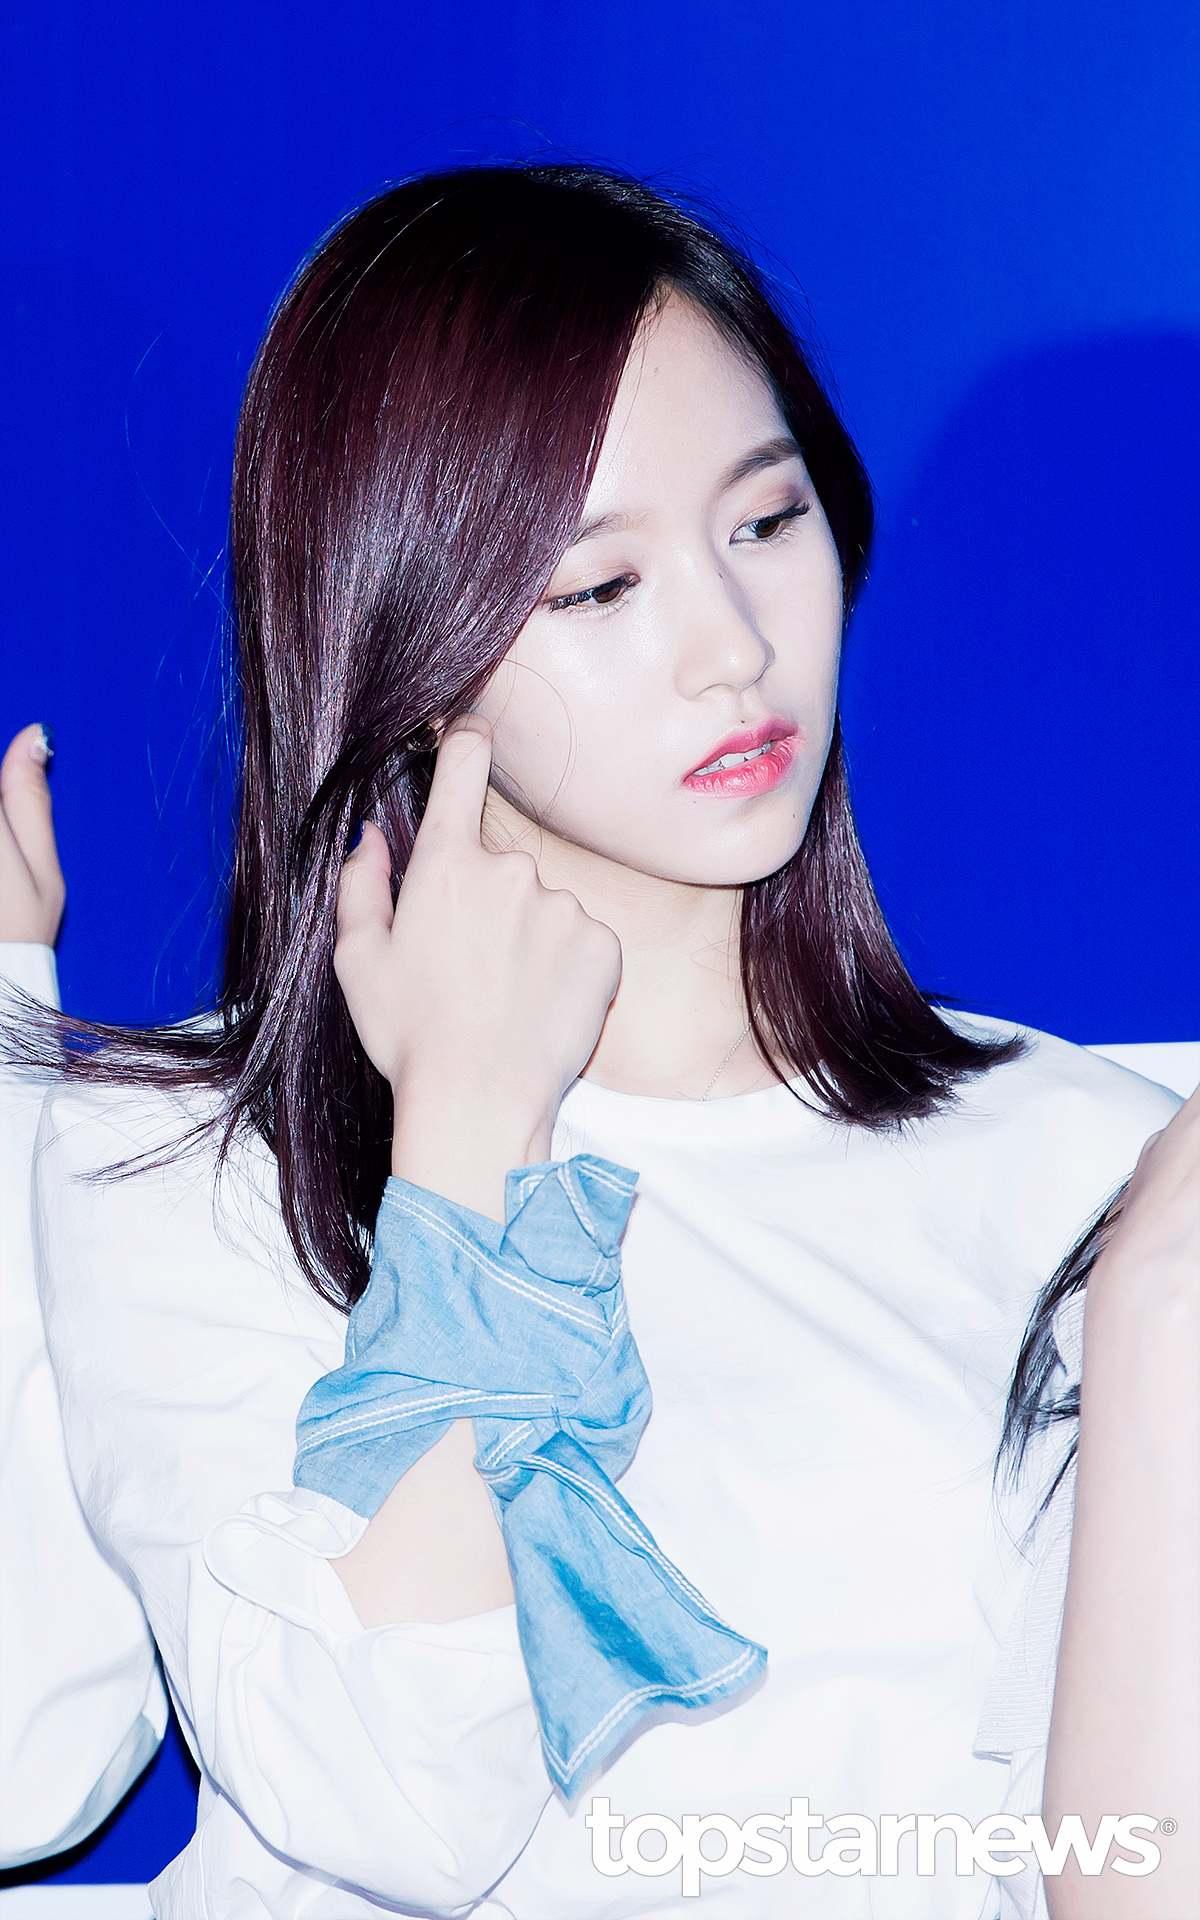 Mina因為性格比較安靜優雅,不太愛說話,所以經常會被有些粉絲覺得個人魅力「稍嫌不足 」。但很多ONCE應該跟小編一樣,就是喜歡這樣安靜的Mina吧!